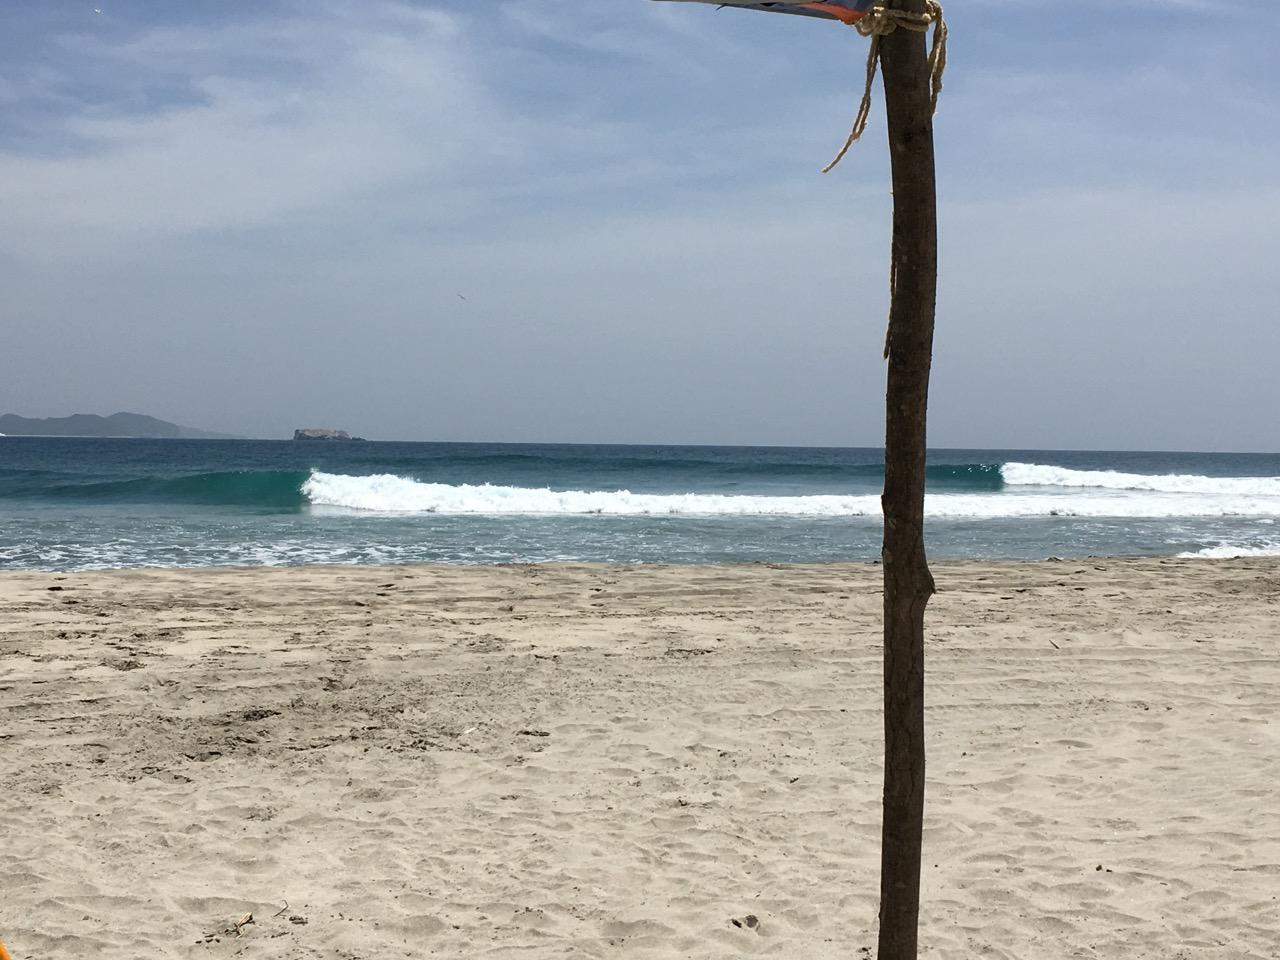 Las Palmeras Surf Resort